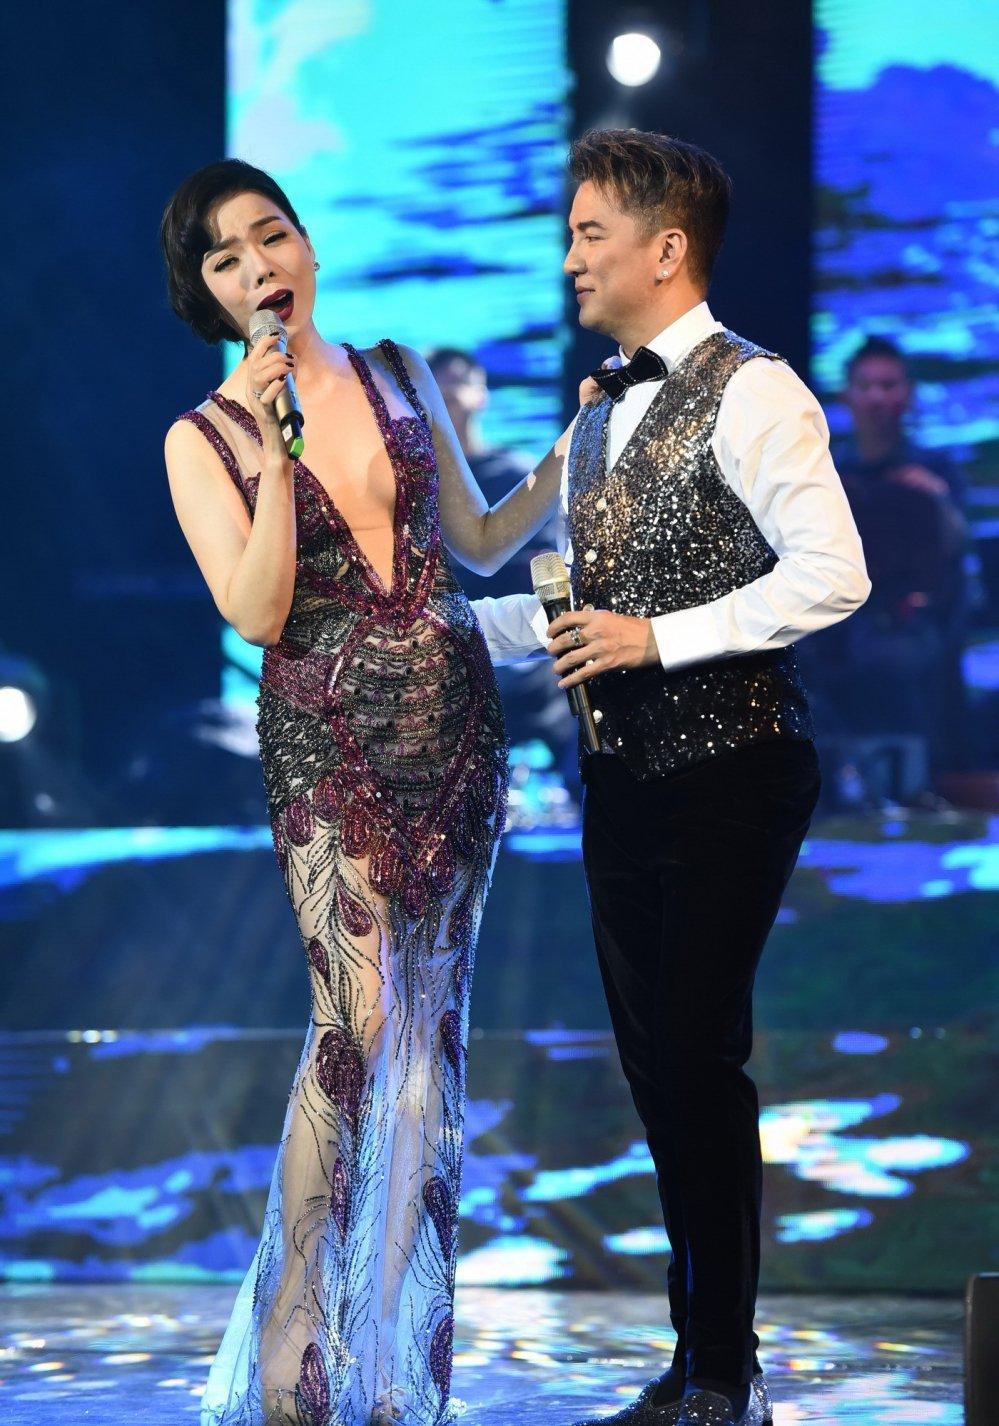 Vua ve nuoc, Huong Giang hat trong liveshow chung cua Dam Vinh Hung - Le Quyen hinh anh 1